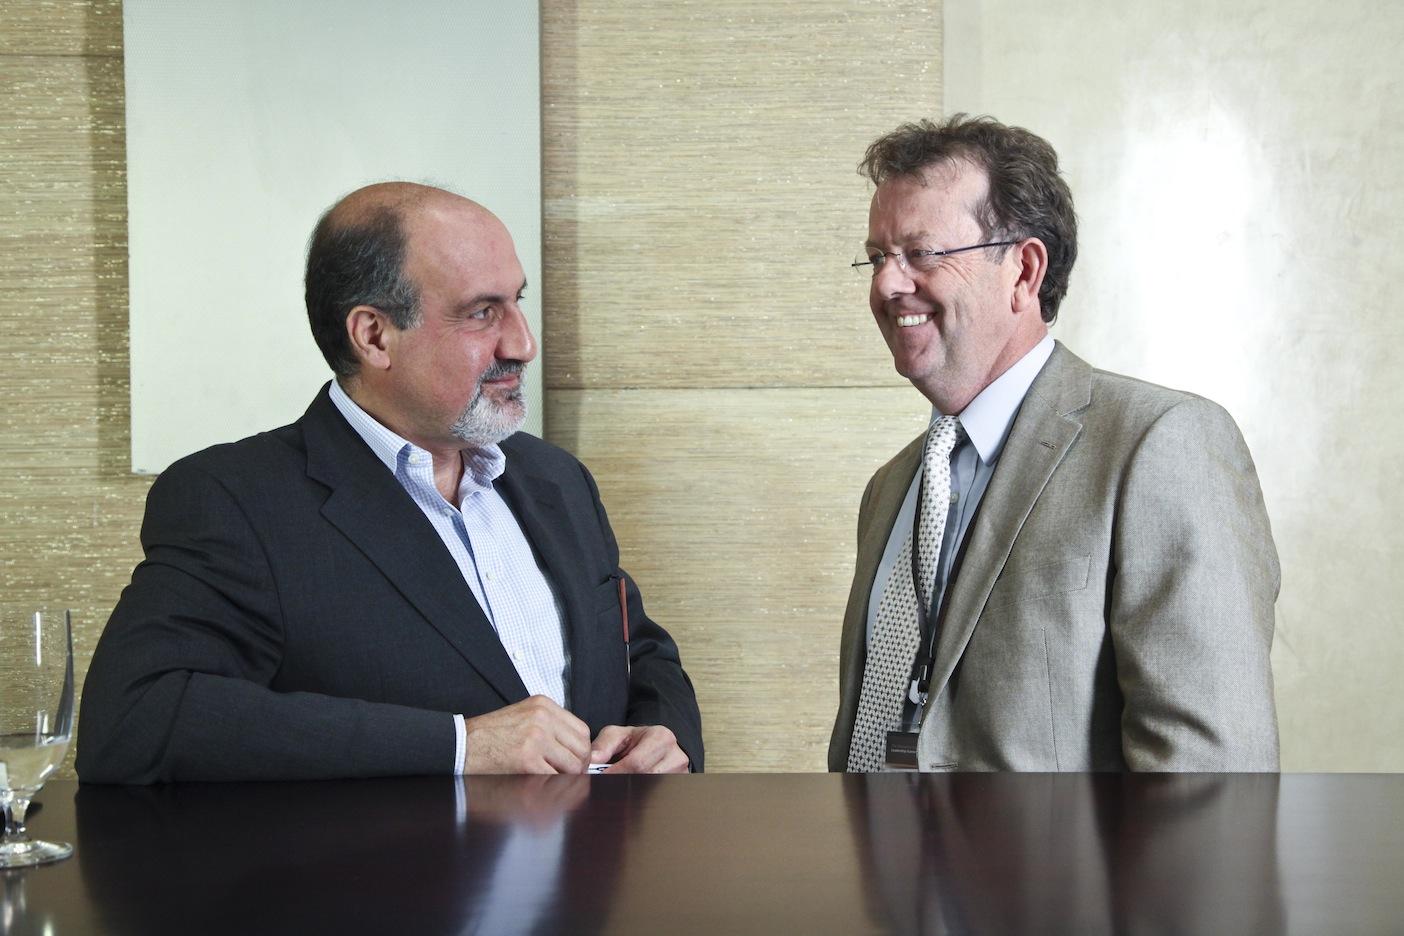 ABH and Nassim Taleb